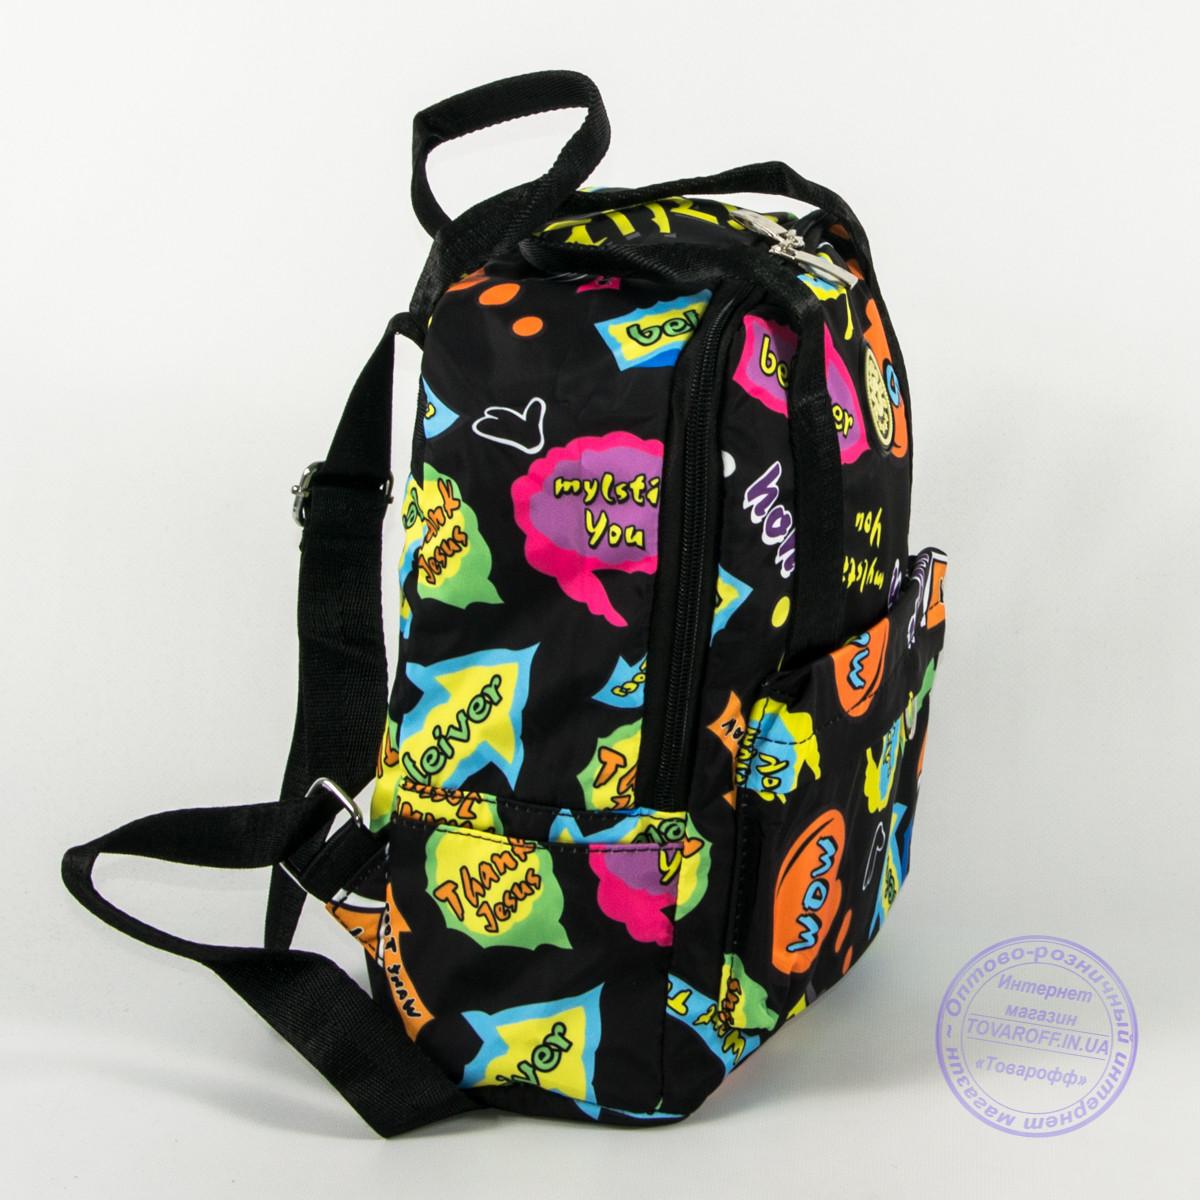 a80dd6b1a57c Сумка-рюкзак для школы и прогулок - черный - s-r1: заказ, цены в ...